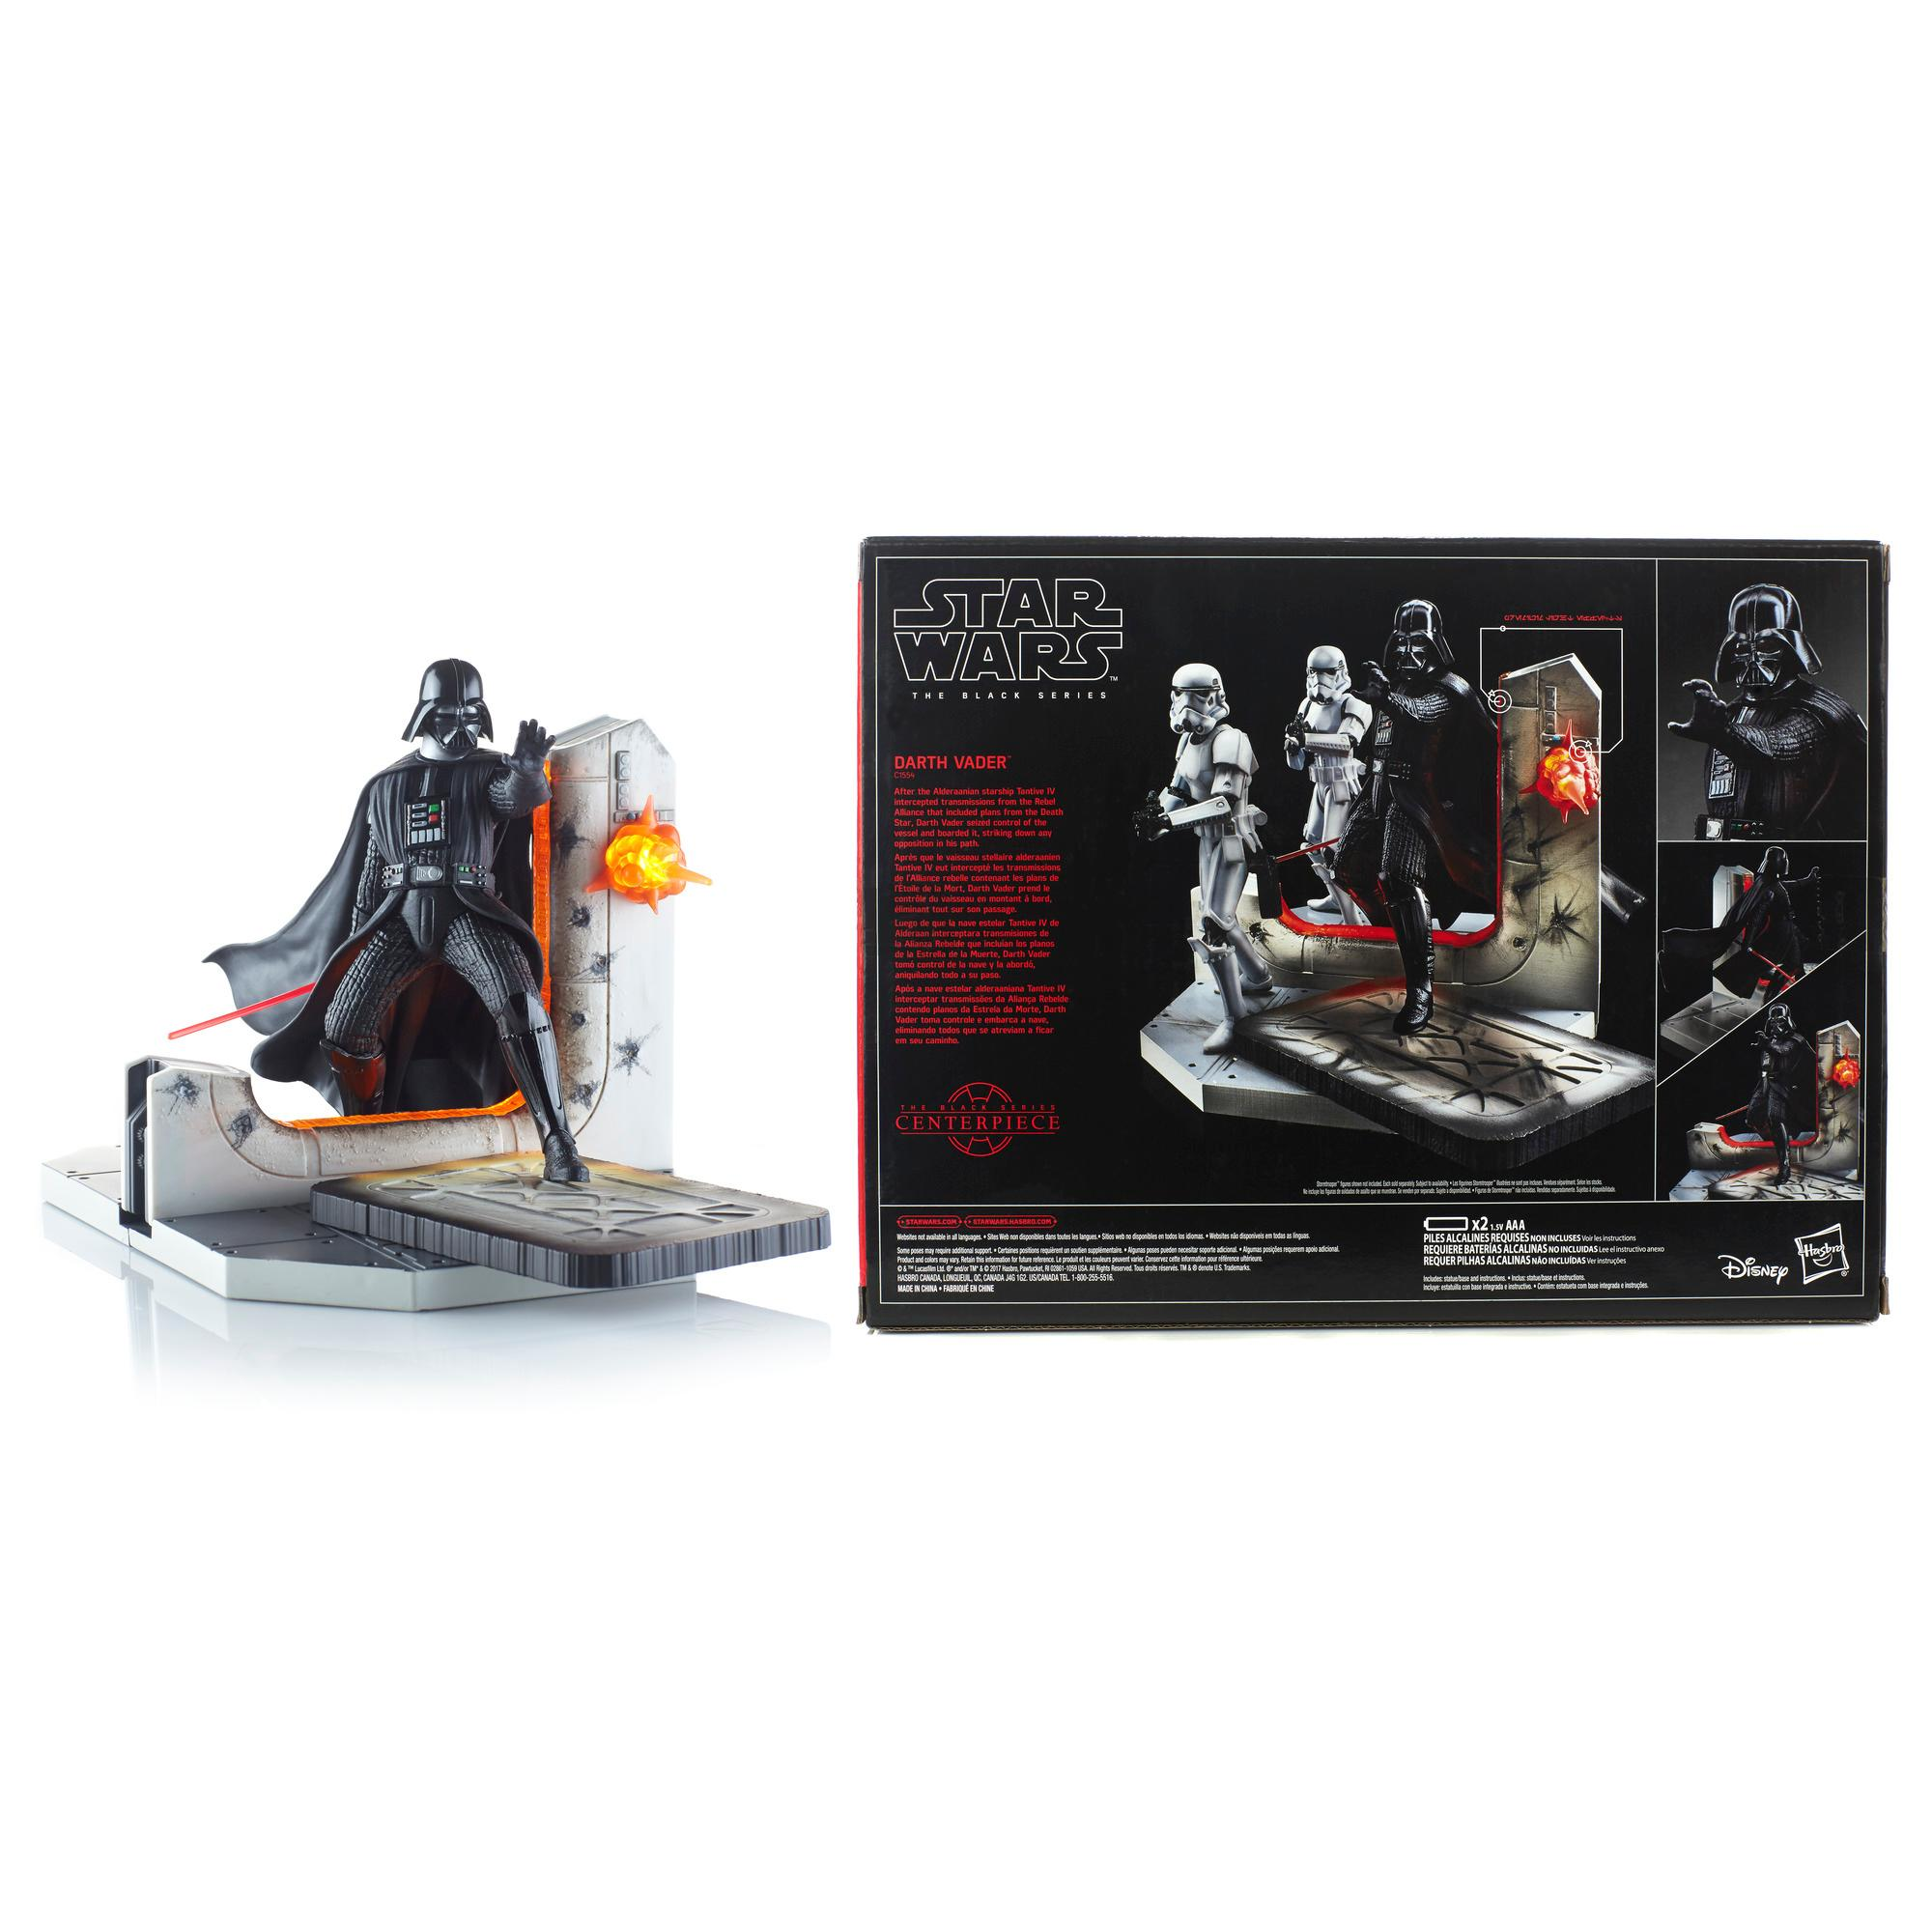 Star Wars The Black Series 6 Darth Vader Diorama Set